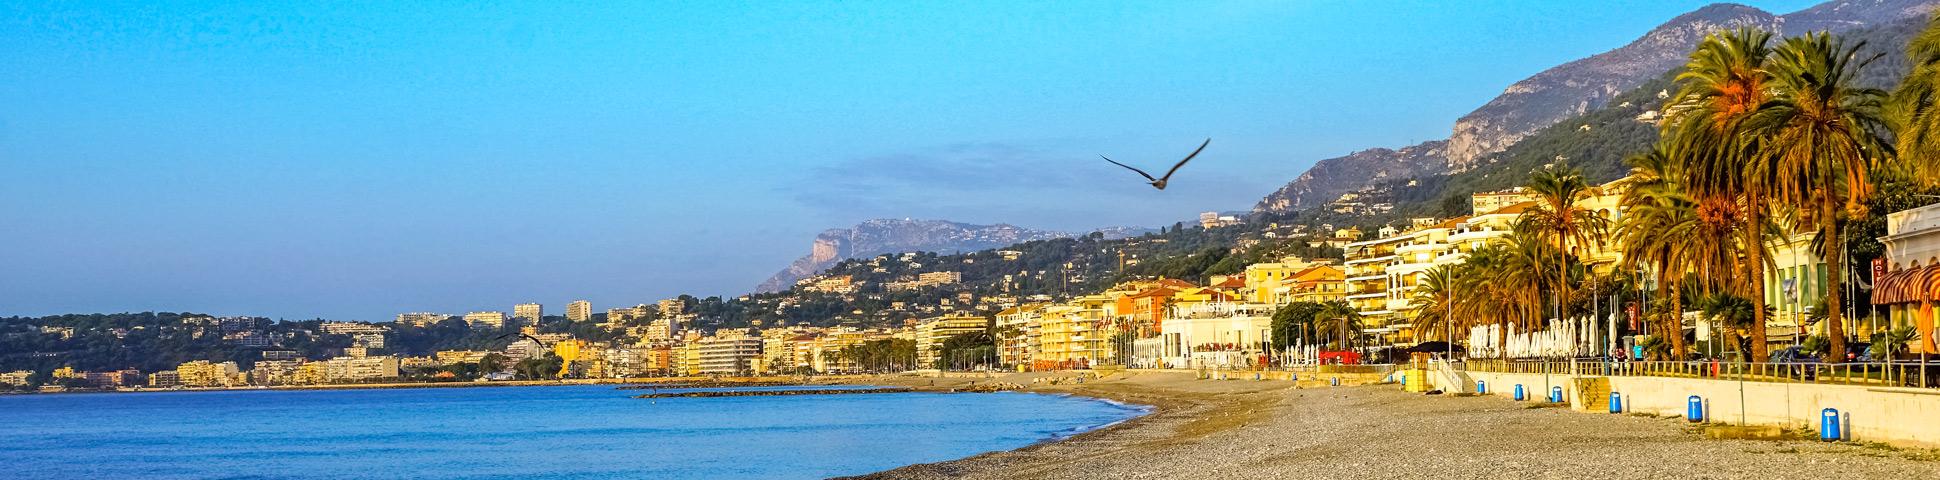 French and Italian Riviera coastline